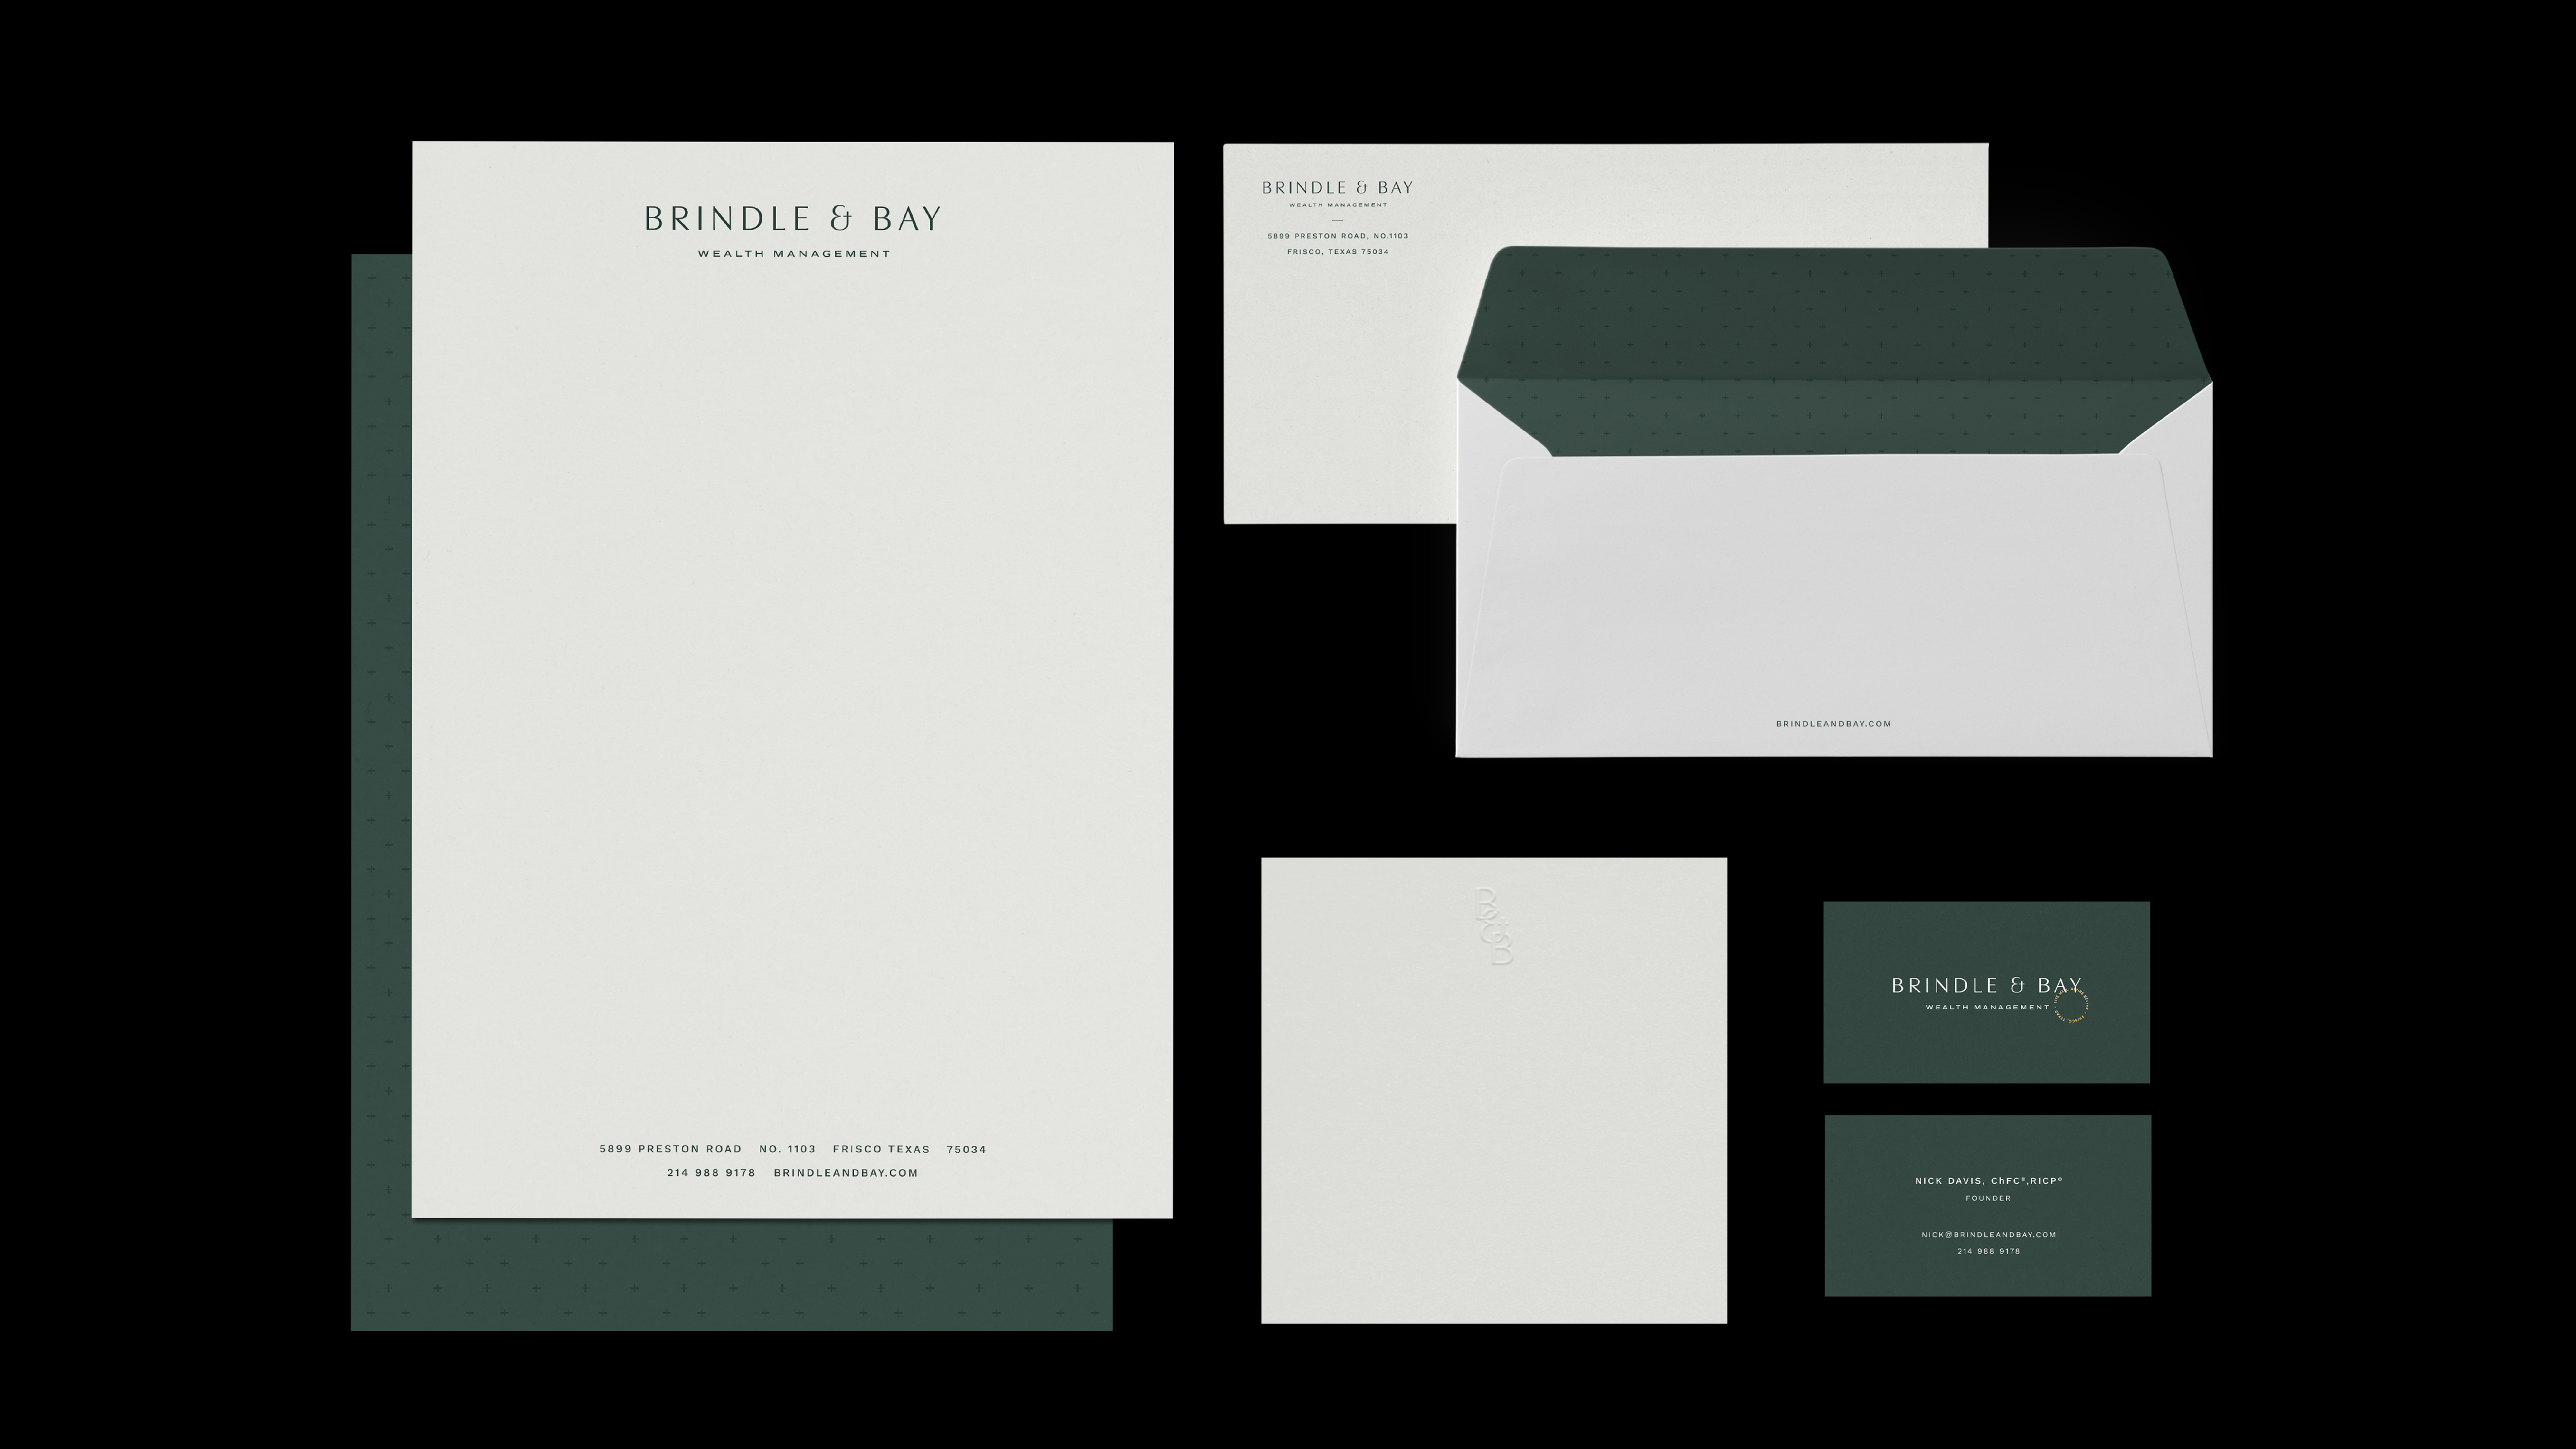 Brindle & Bay Stationery Suite Mockup